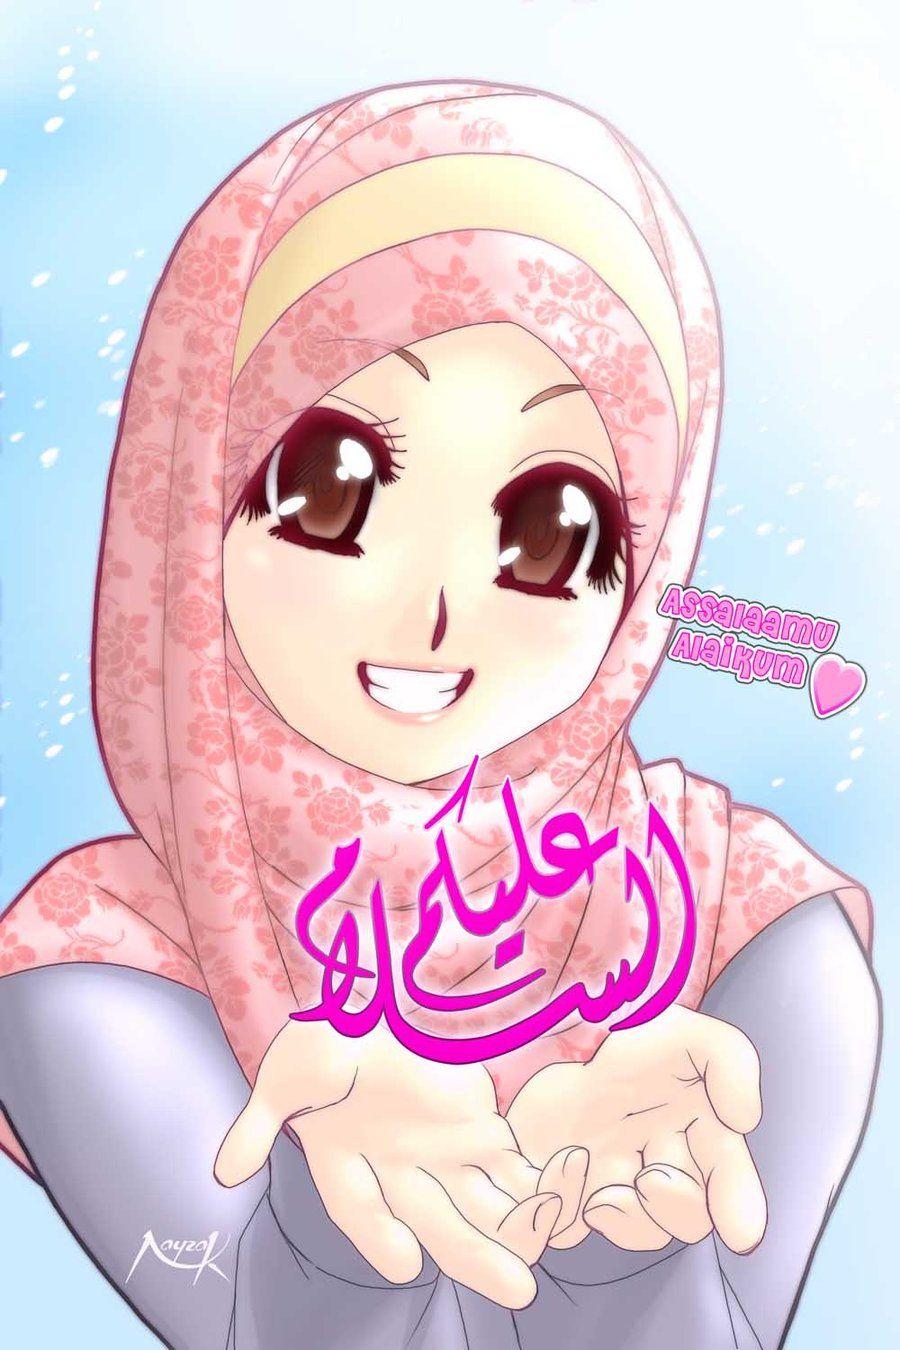 Gambar Kartun Muslimah II Sang Manusia Akhir Zaman